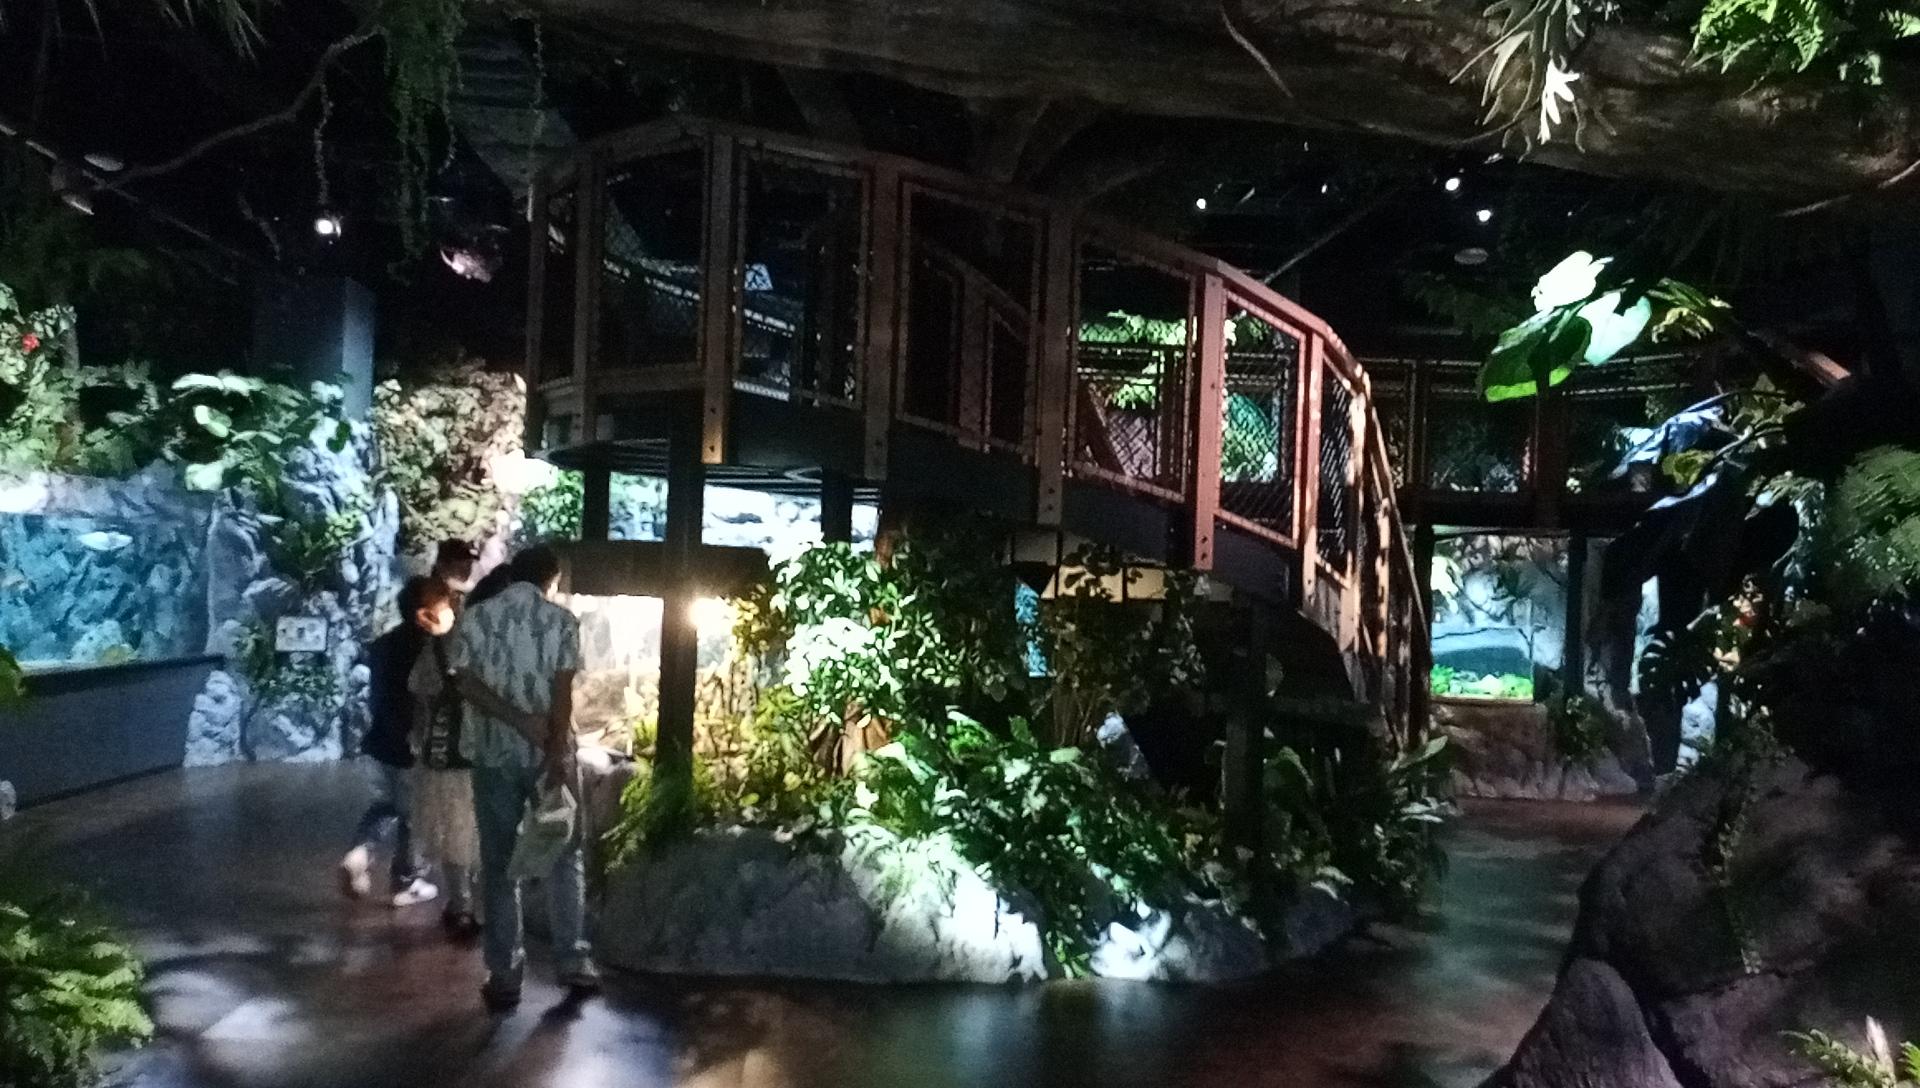 DMMかりゆし水族館入ったら最初は熱帯の雰囲気